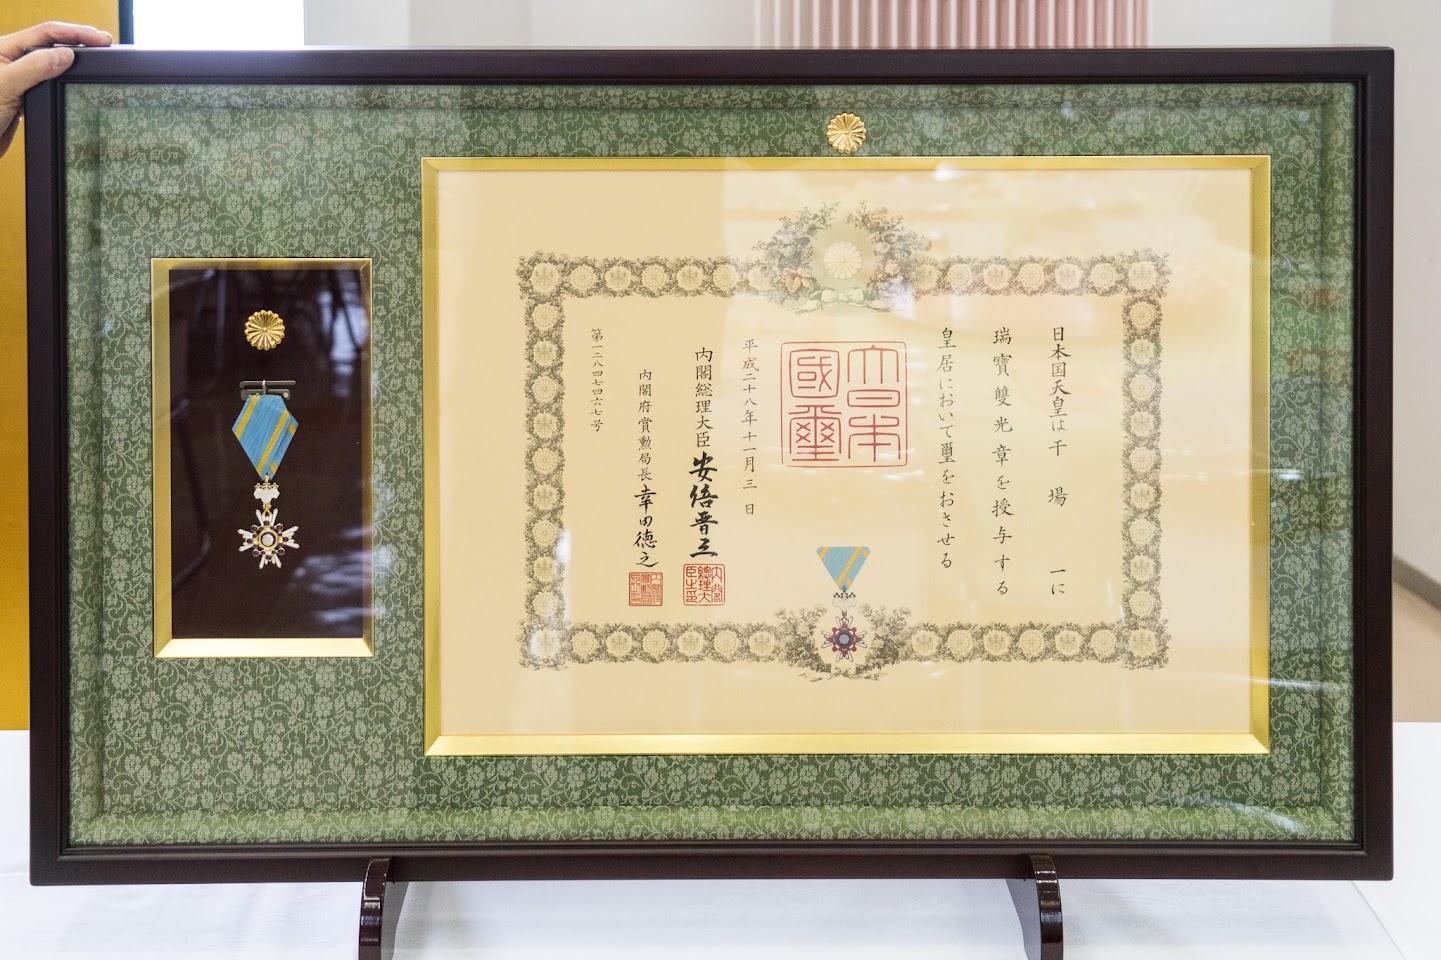 平成28年度秋の叙勲「瑞宝双光章」